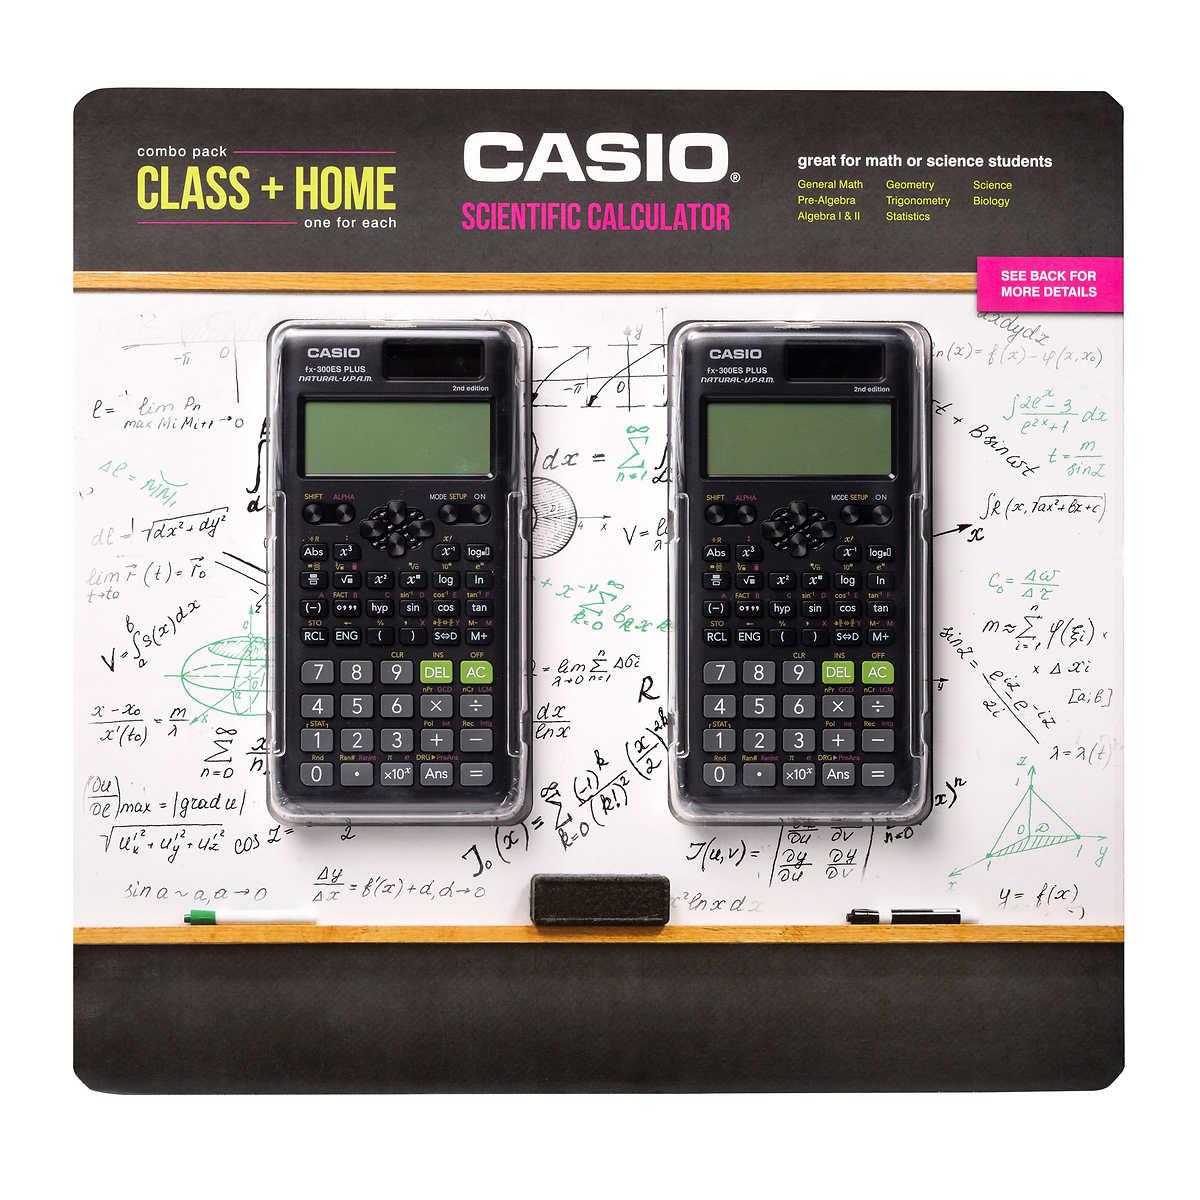 Casio Fx 300espls2 S 2nd Edition Scientific Calculator 2 Pack